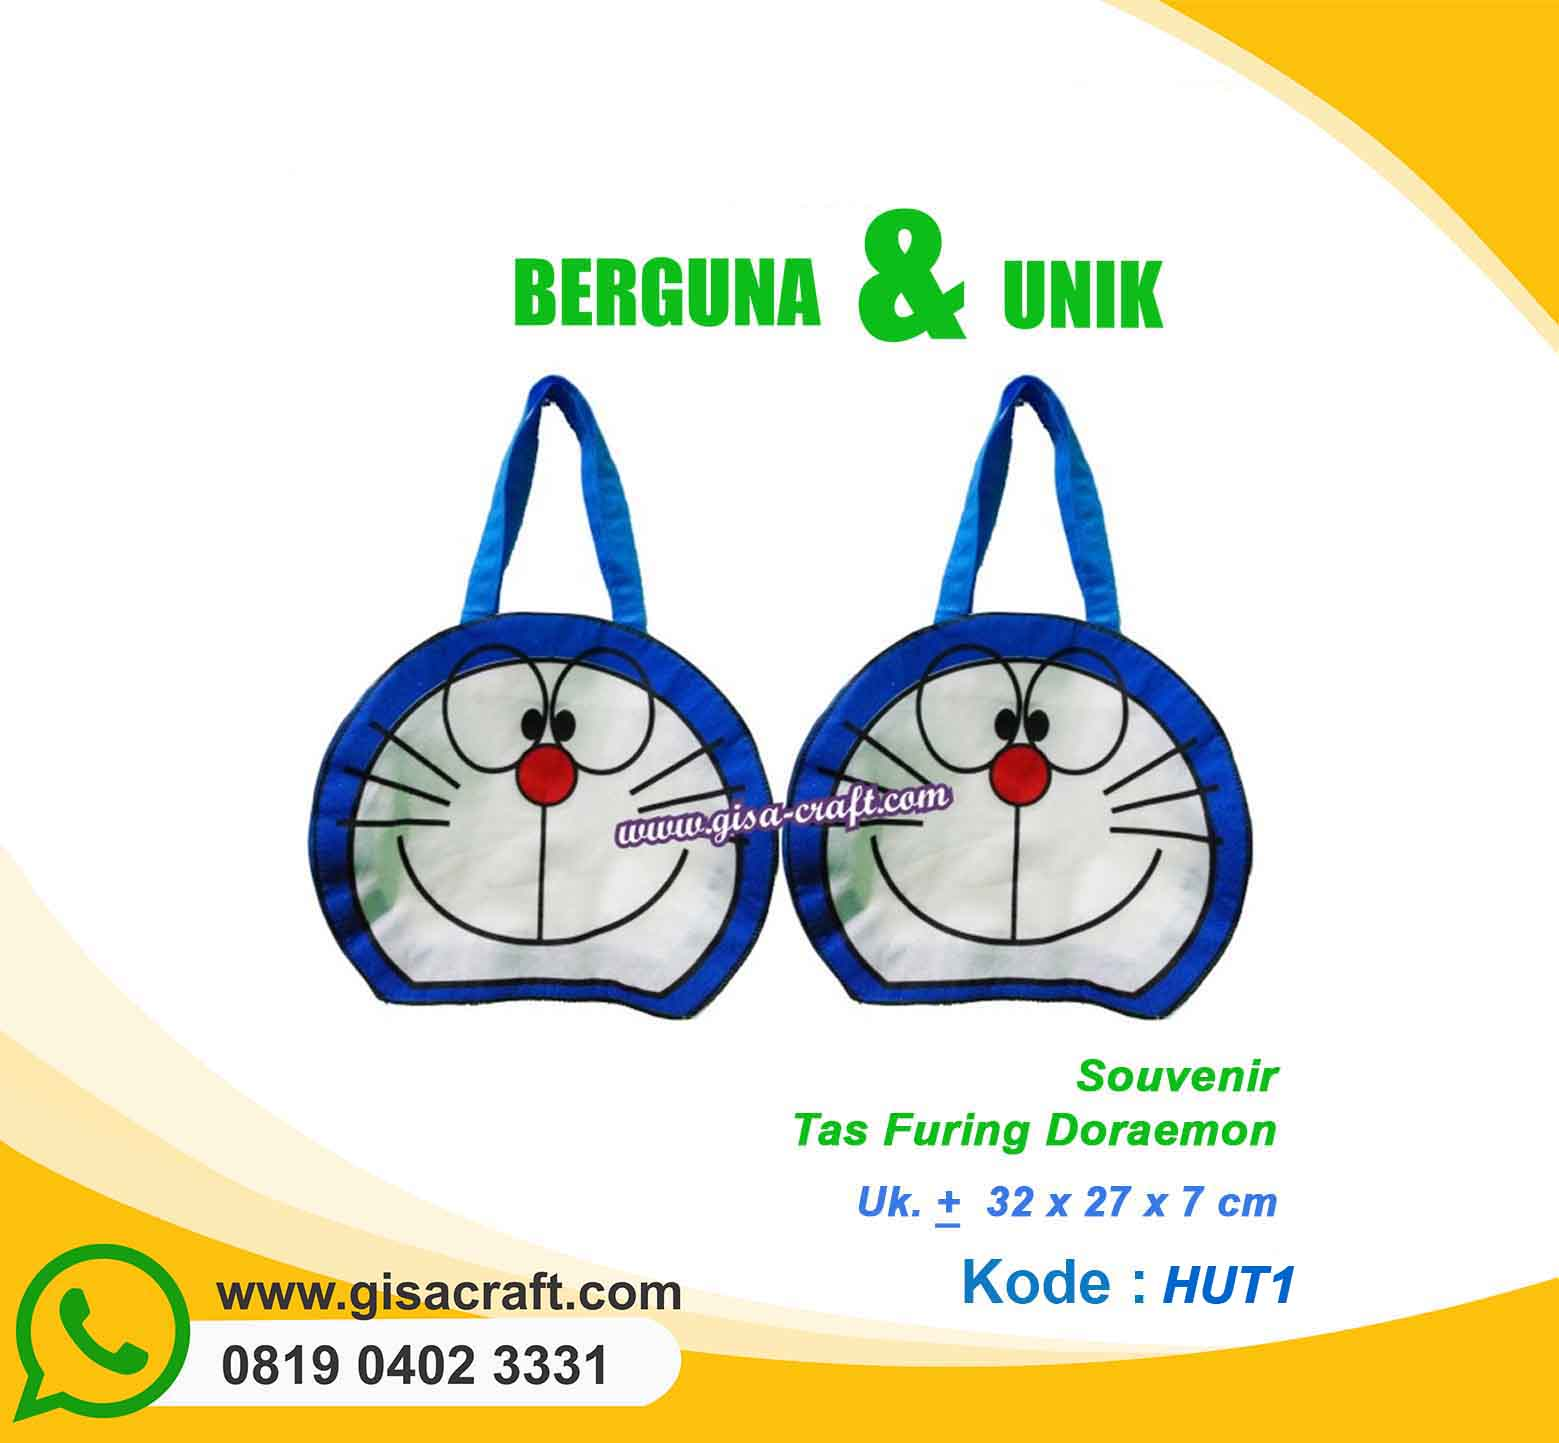 Souvenir Tas Furing Doraemon HUT1